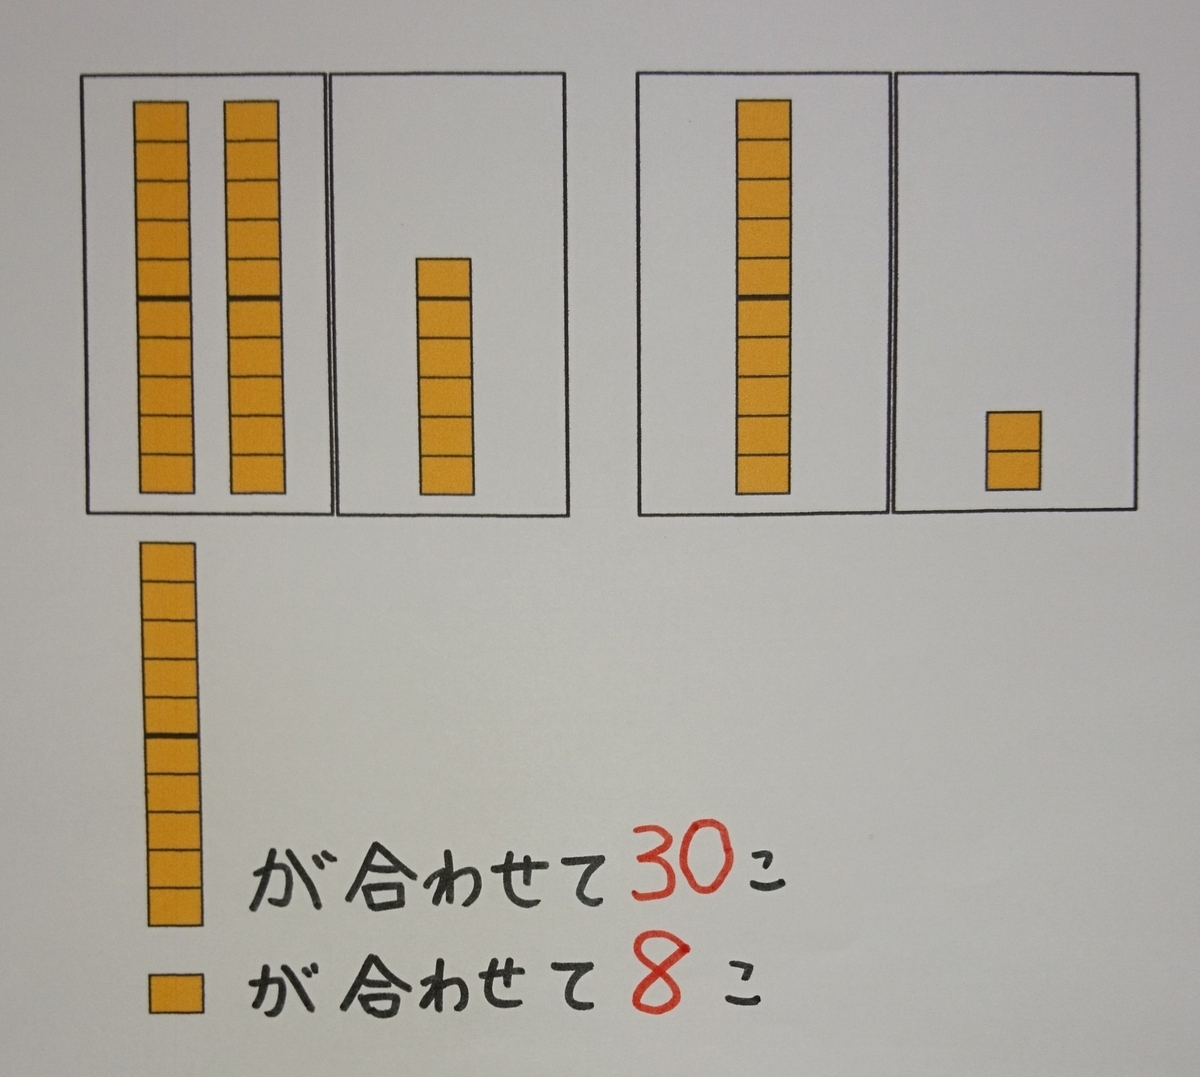 f:id:usa87mama:20200318223255j:plain